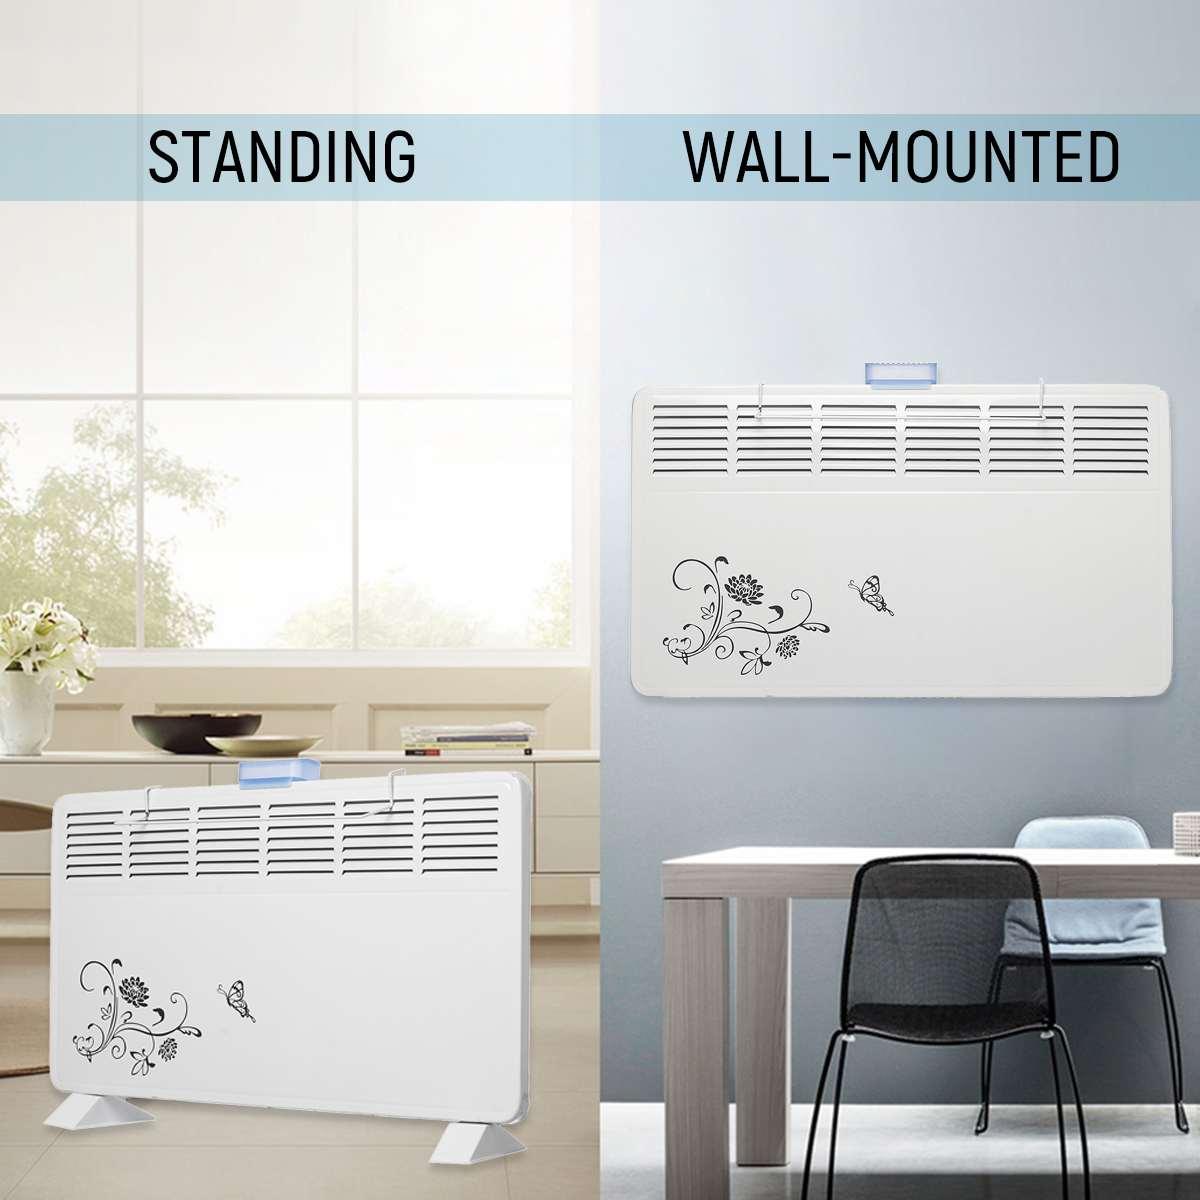 2000W 220V Winter Electric Heater 6 Windows Heater Wall Metal Shell Stove Radiator Warmer Household Room Heating Fan Machine